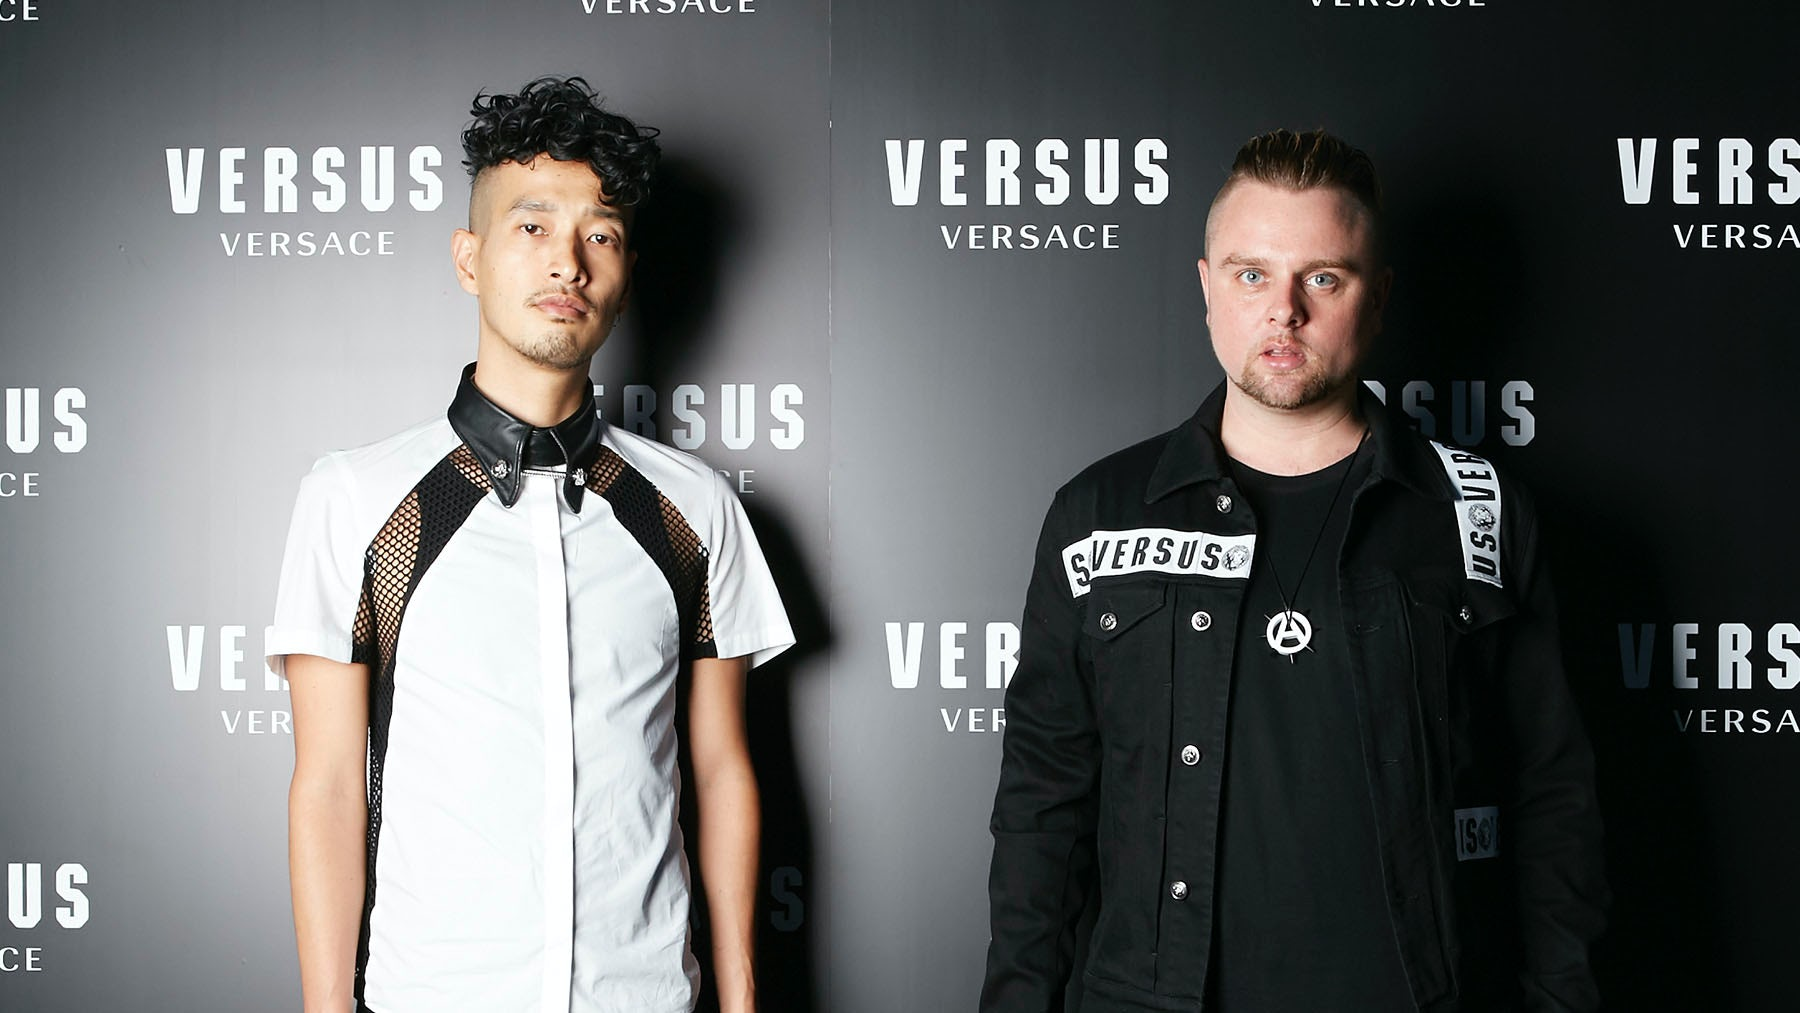 From left: Joe Kazuaki and Dan Bailey | Source: Tokyo Dandy